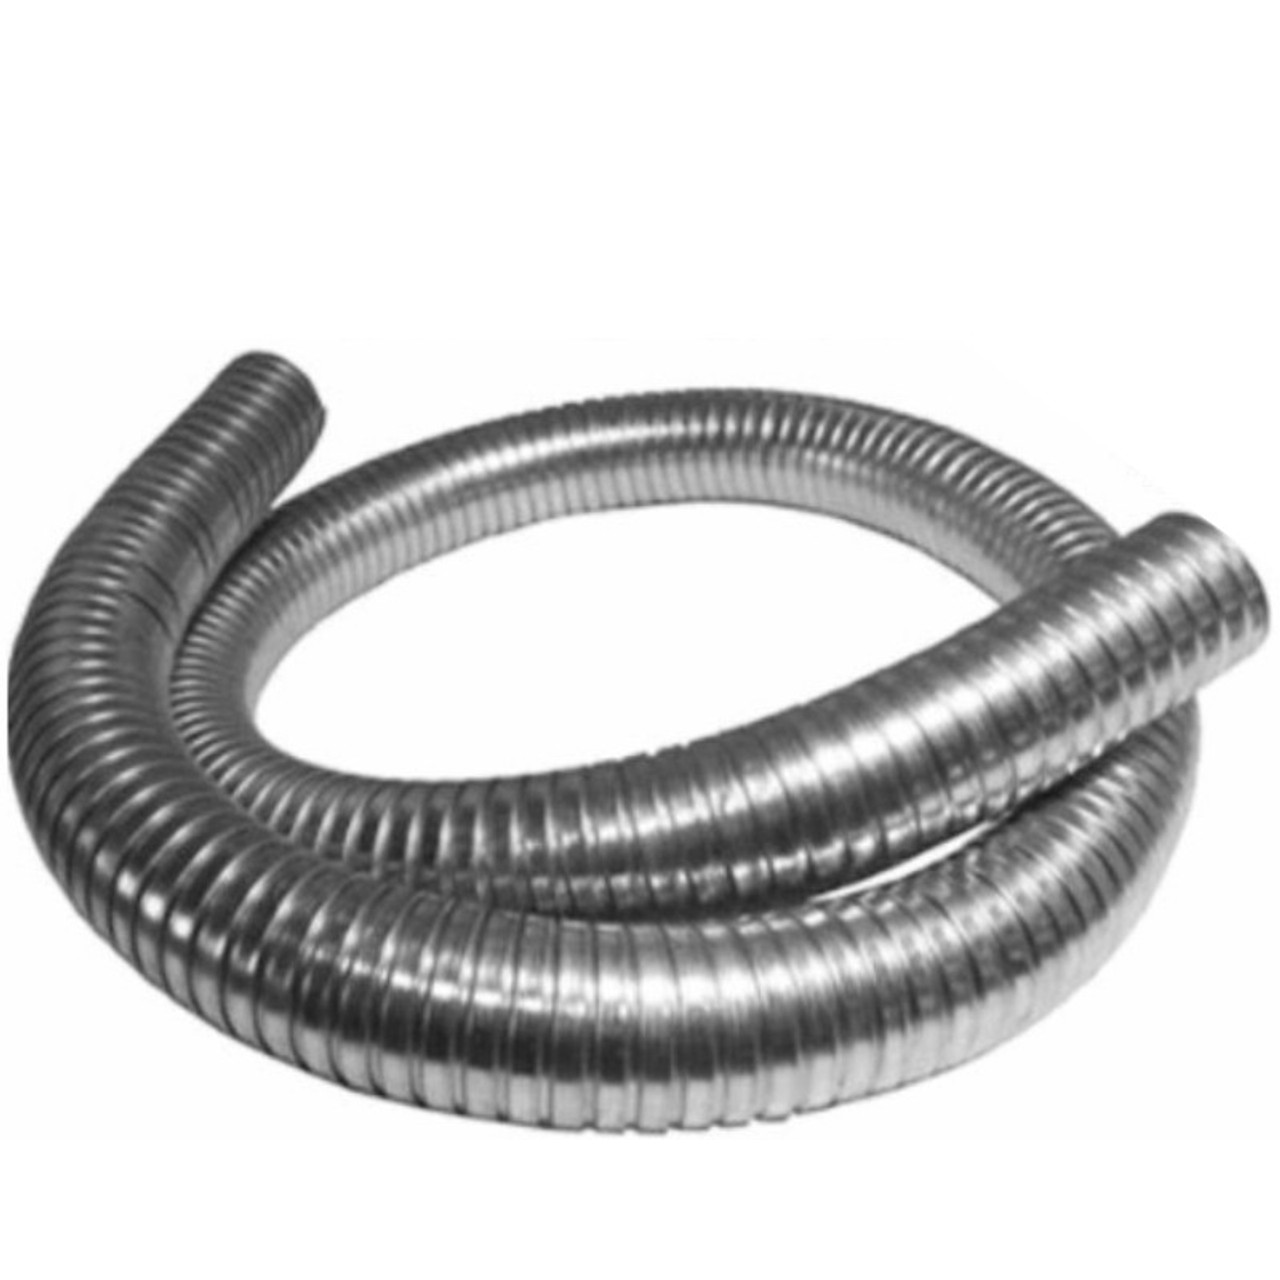 10 x 120 exhaust flex hose 304 stainless steel 302 1020 120